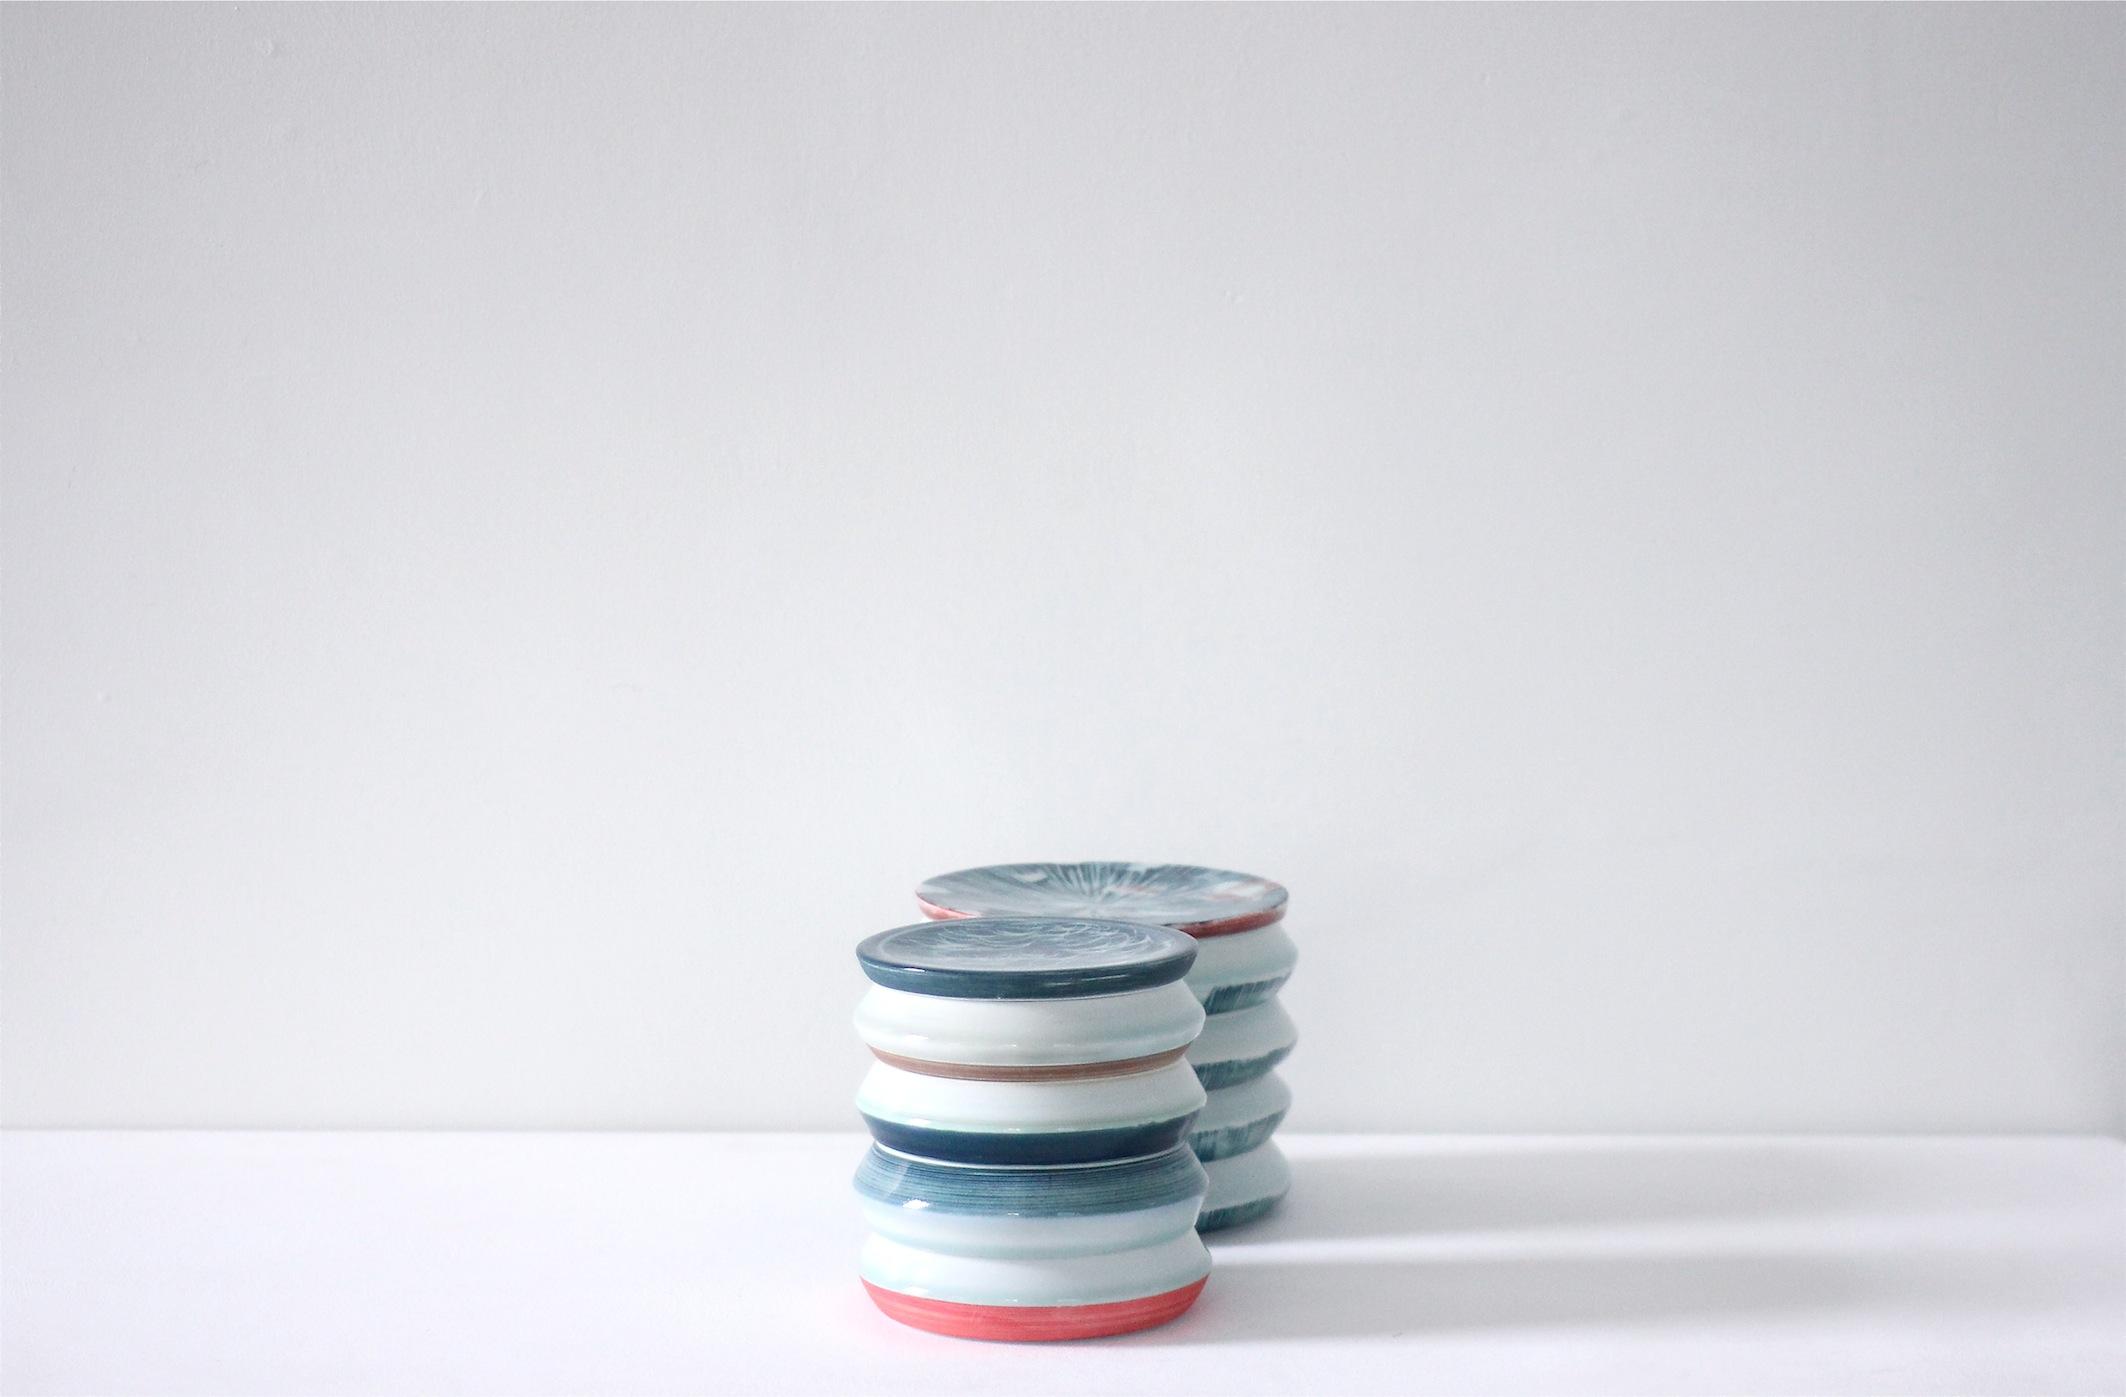 Adam Frew, Stacking I and III, porcelain